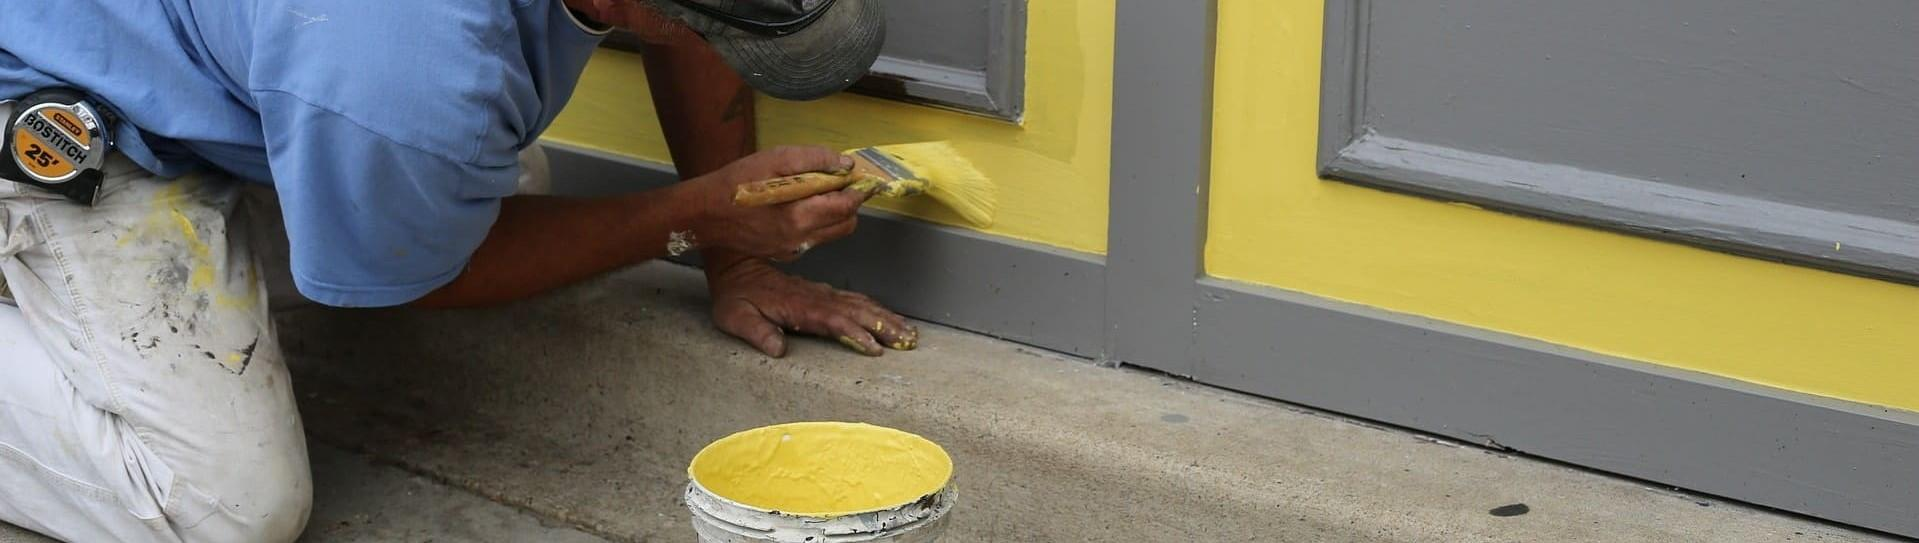 Reyners Lionel - Peintre en bâtiment - Wazaa